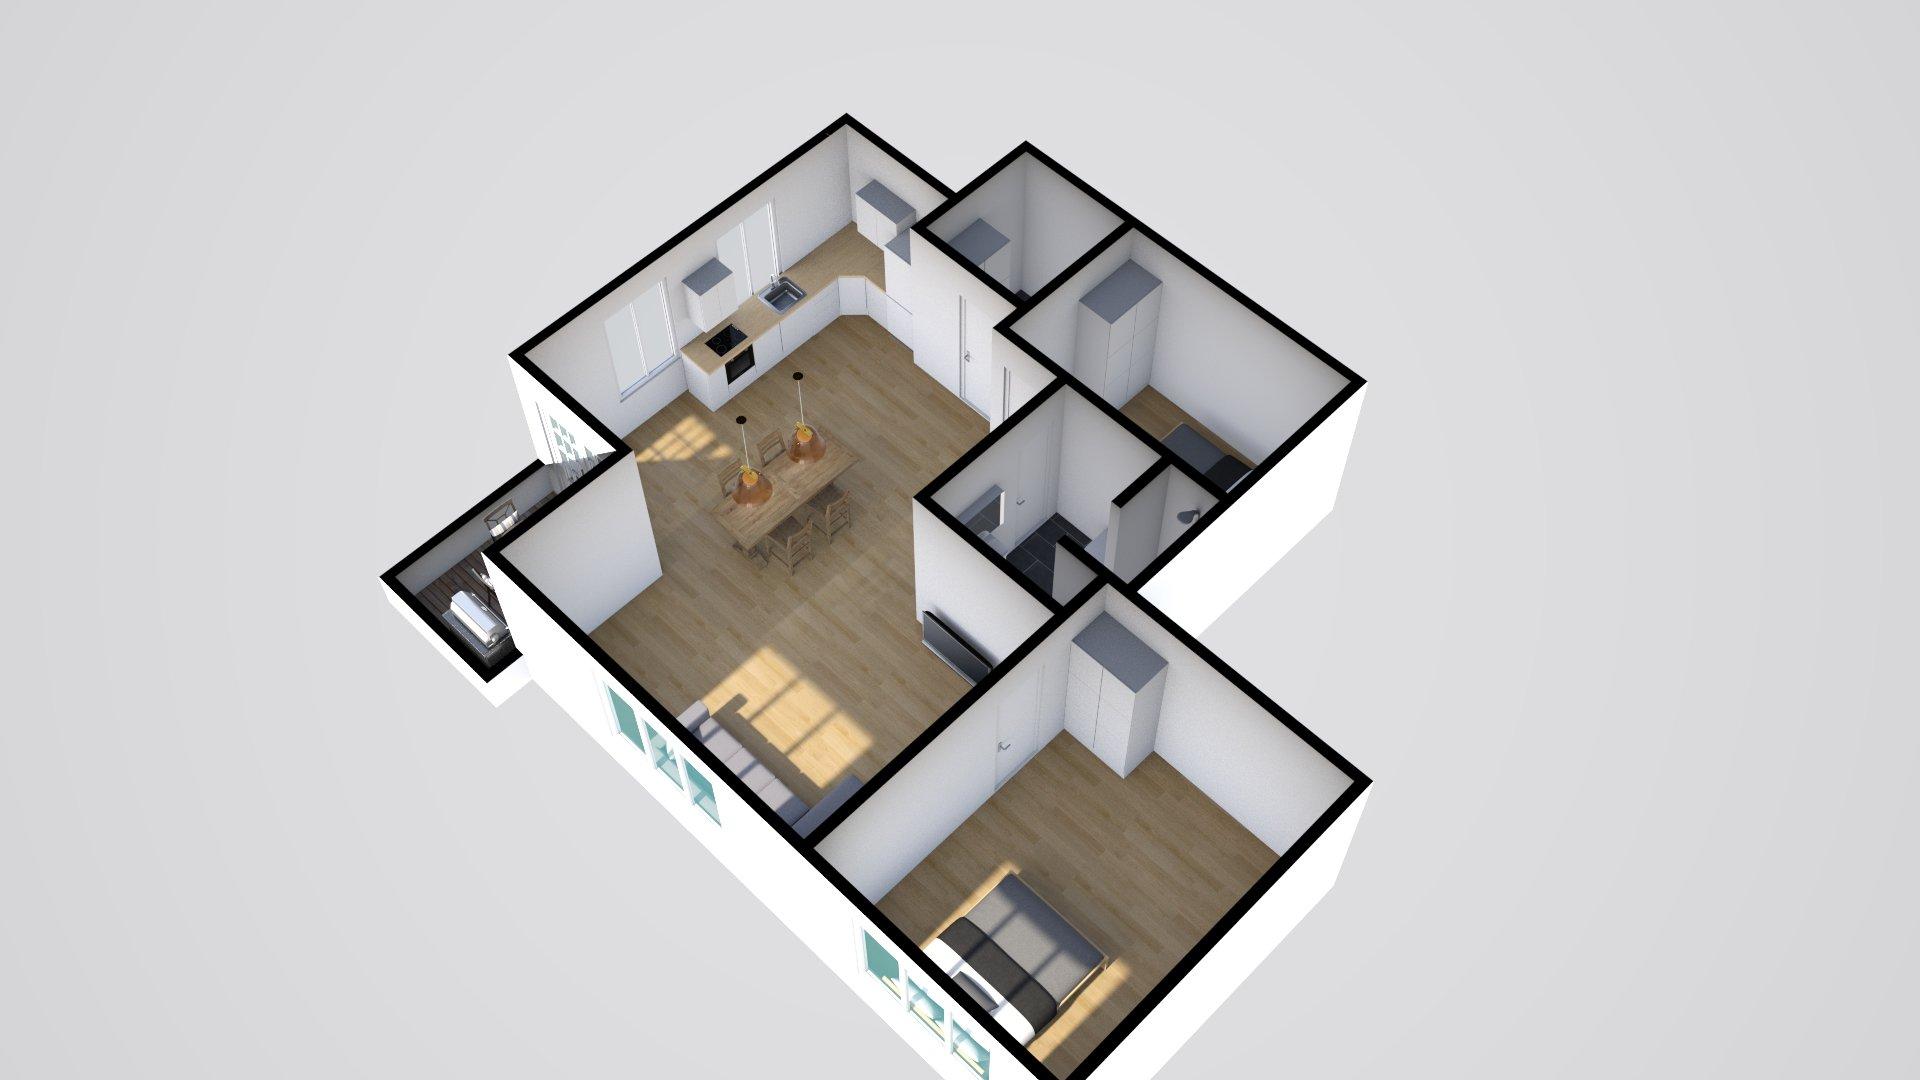 3D 2 Horsensvej 5, Hovedgård